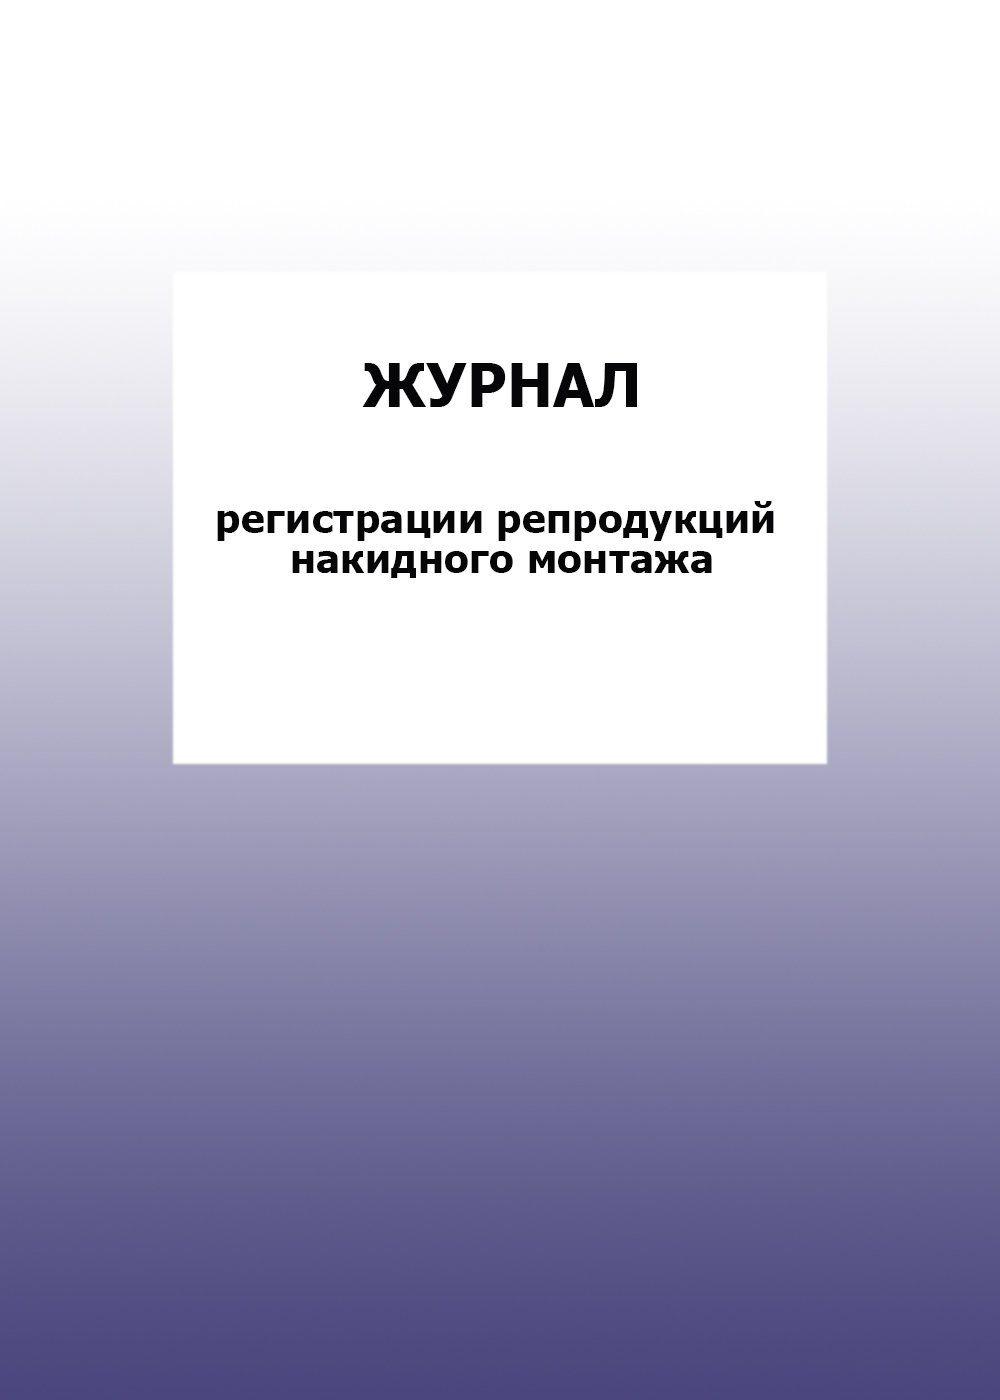 Журнал регистрации репродукций накидного монтажа: упаковка 100 шт.